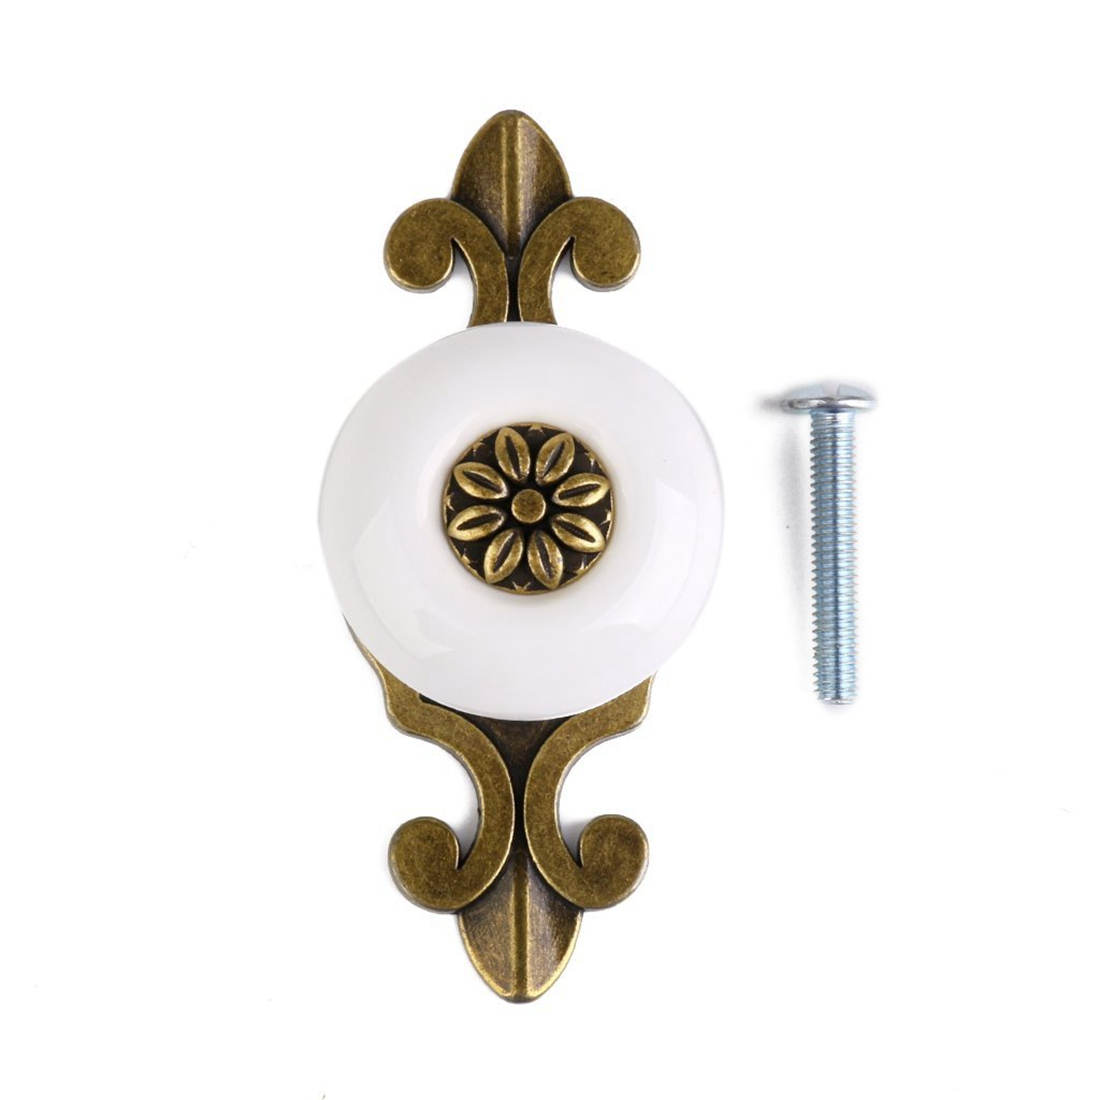 1pc Retro Furniture Drawer Cabinet Wardrobe Ceramic Round Knob Metal Pull Handle (Bronze + White)